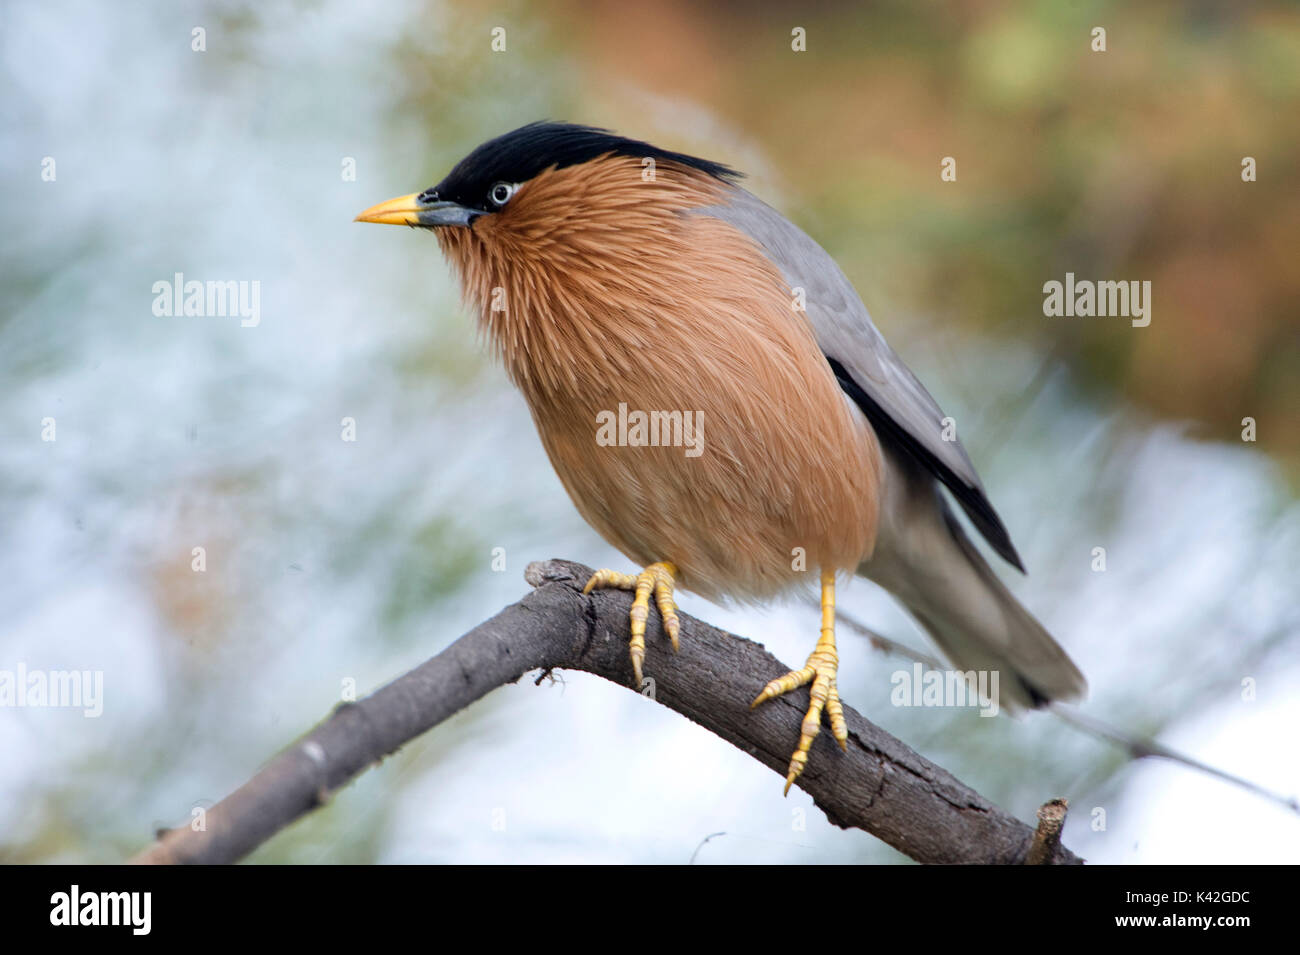 Brahminy Myna or Brahminy Starling, Sturnia pagodarum, Keoladeo Ghana National Park, Rajasthan, India, formerly known as the Bharatpur Bird Sanctuary, - Stock Image